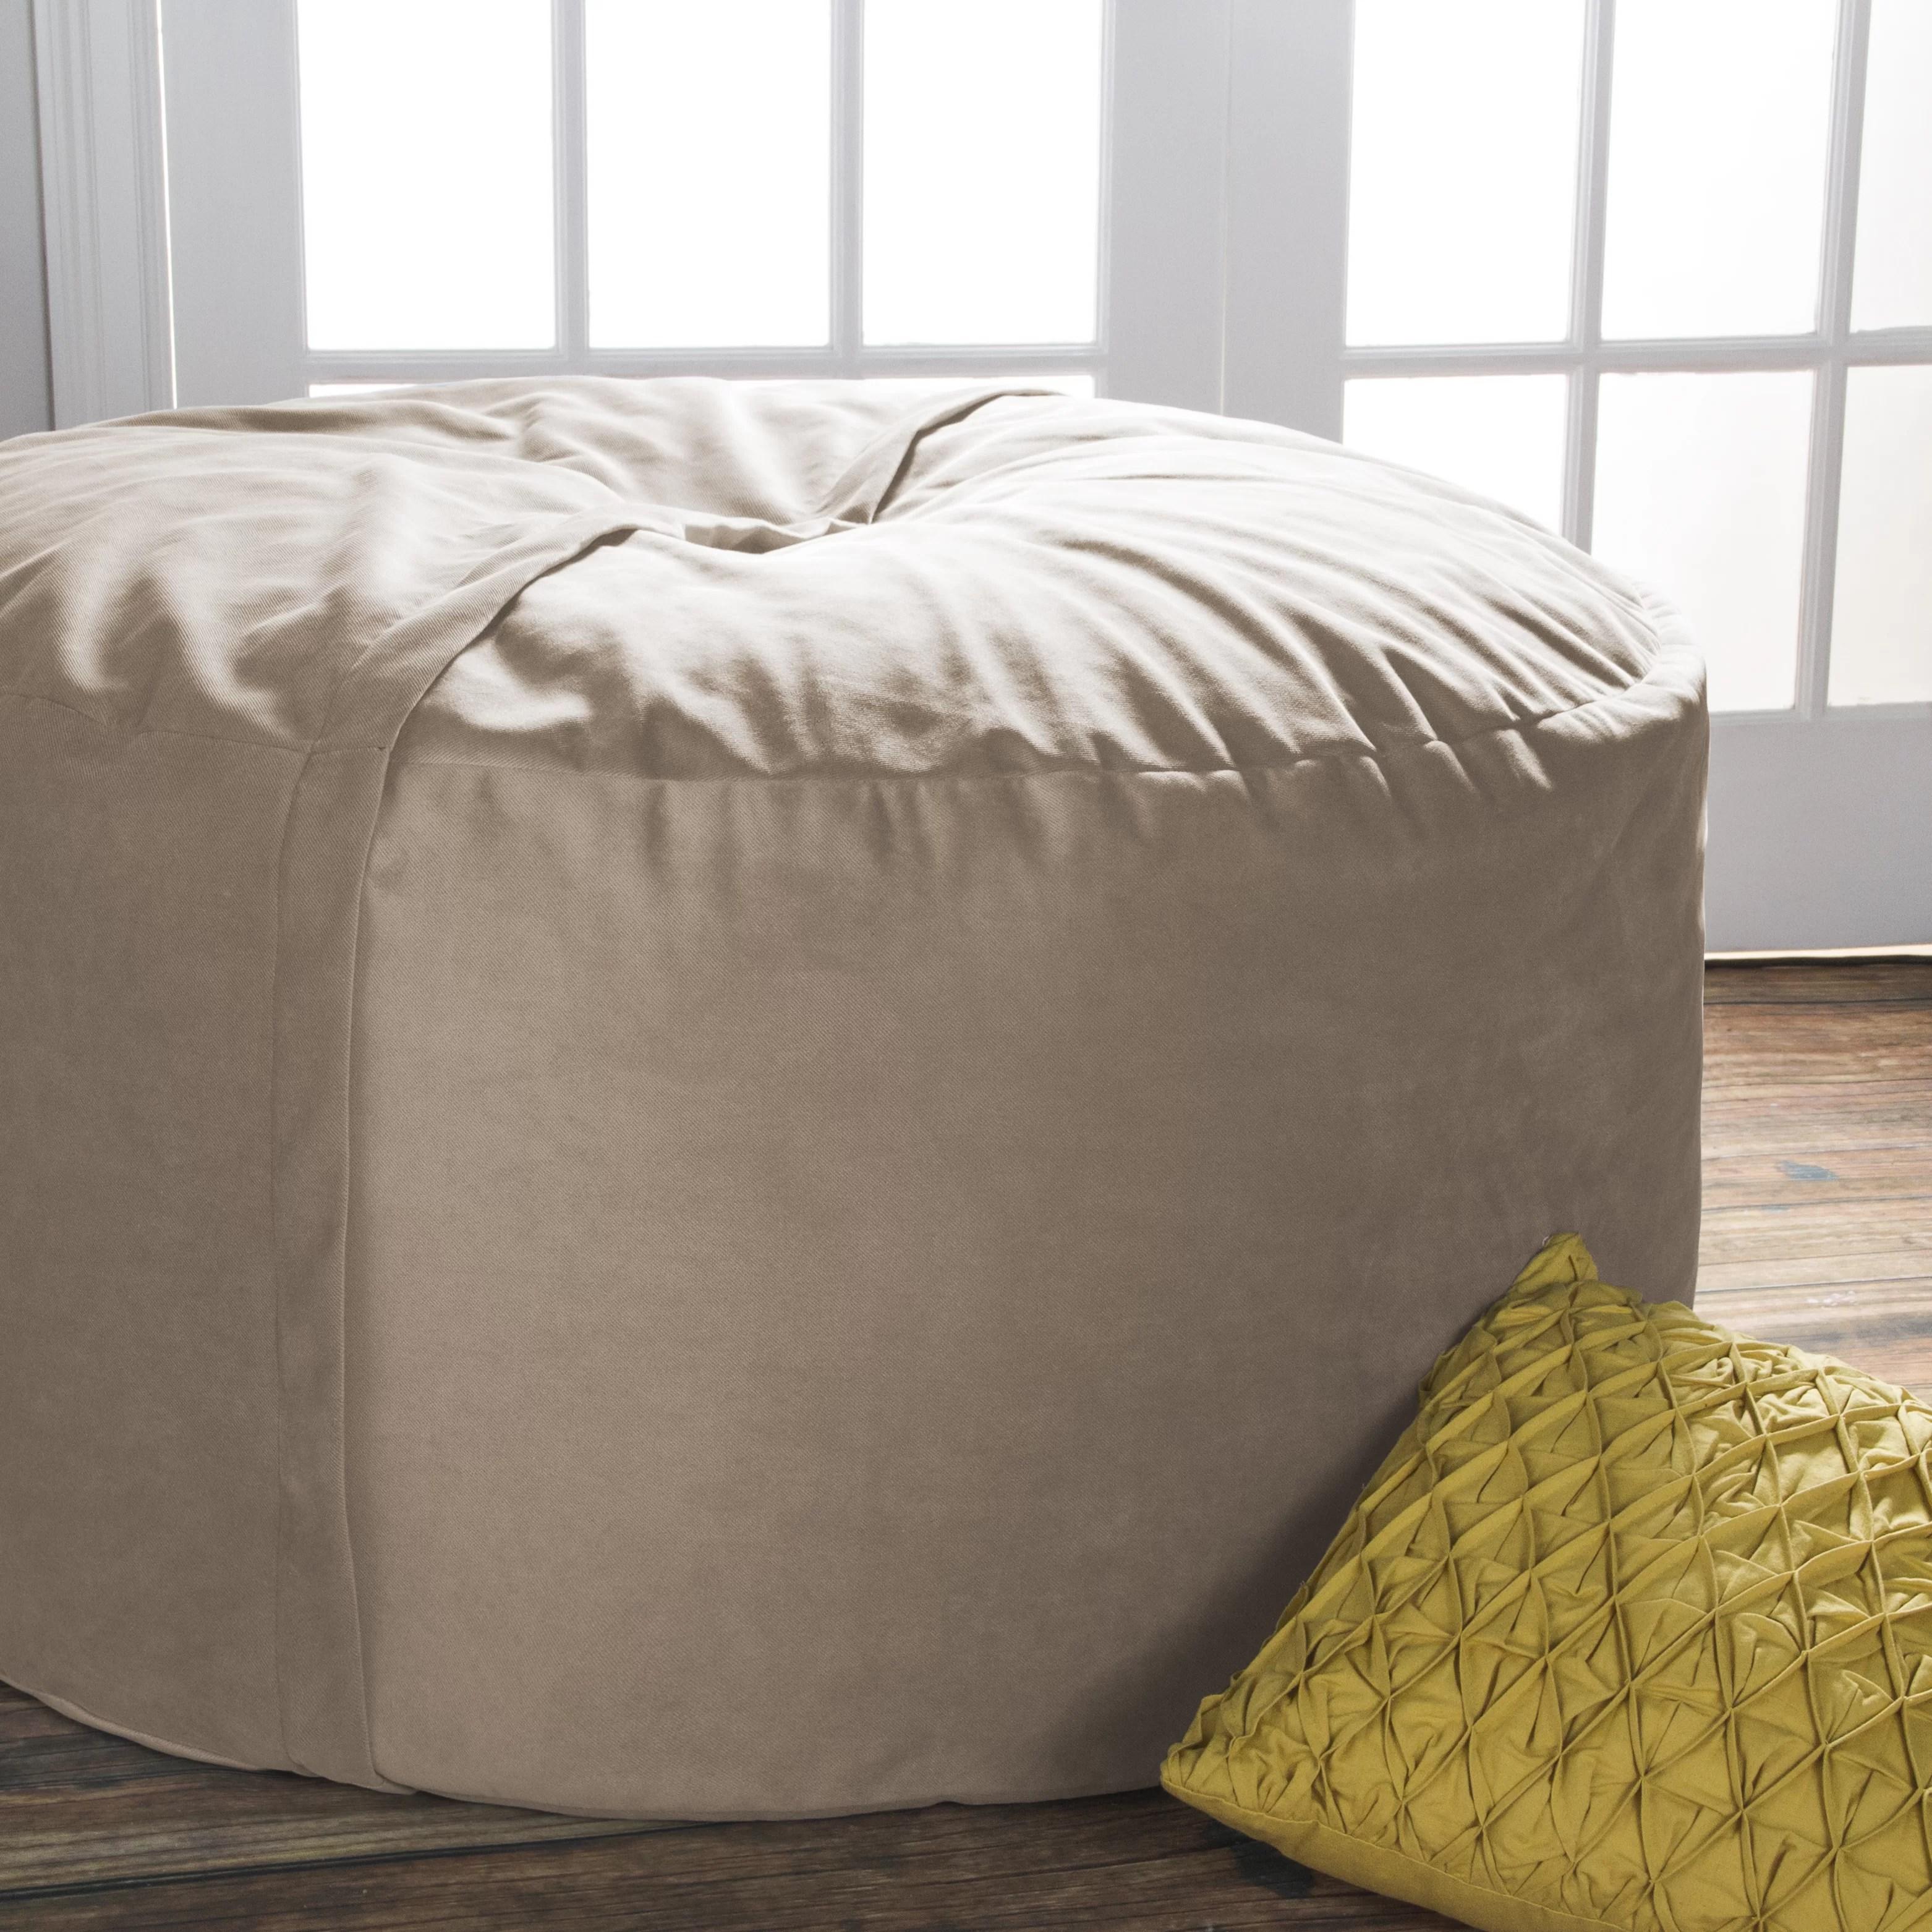 jaxx bean bag chair menards white lawn chairs large gaming and reviews wayfair